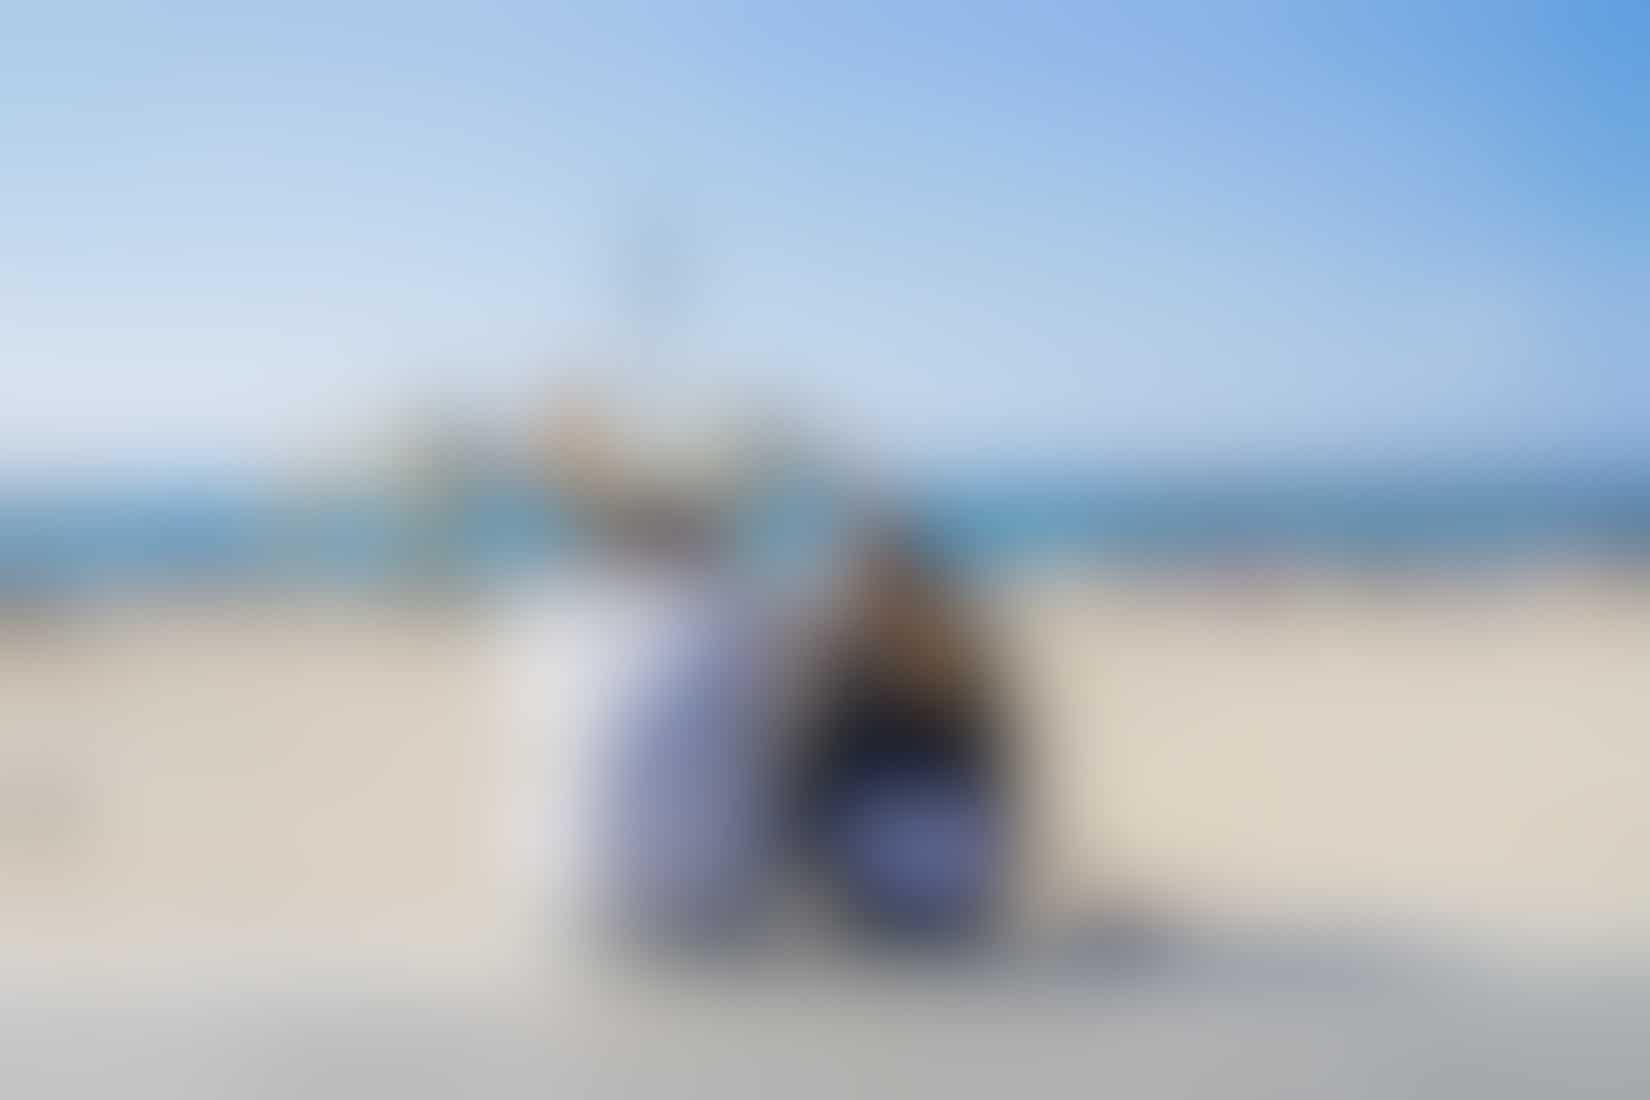 A couple sitting on the beach in Tel Aviv, Israel